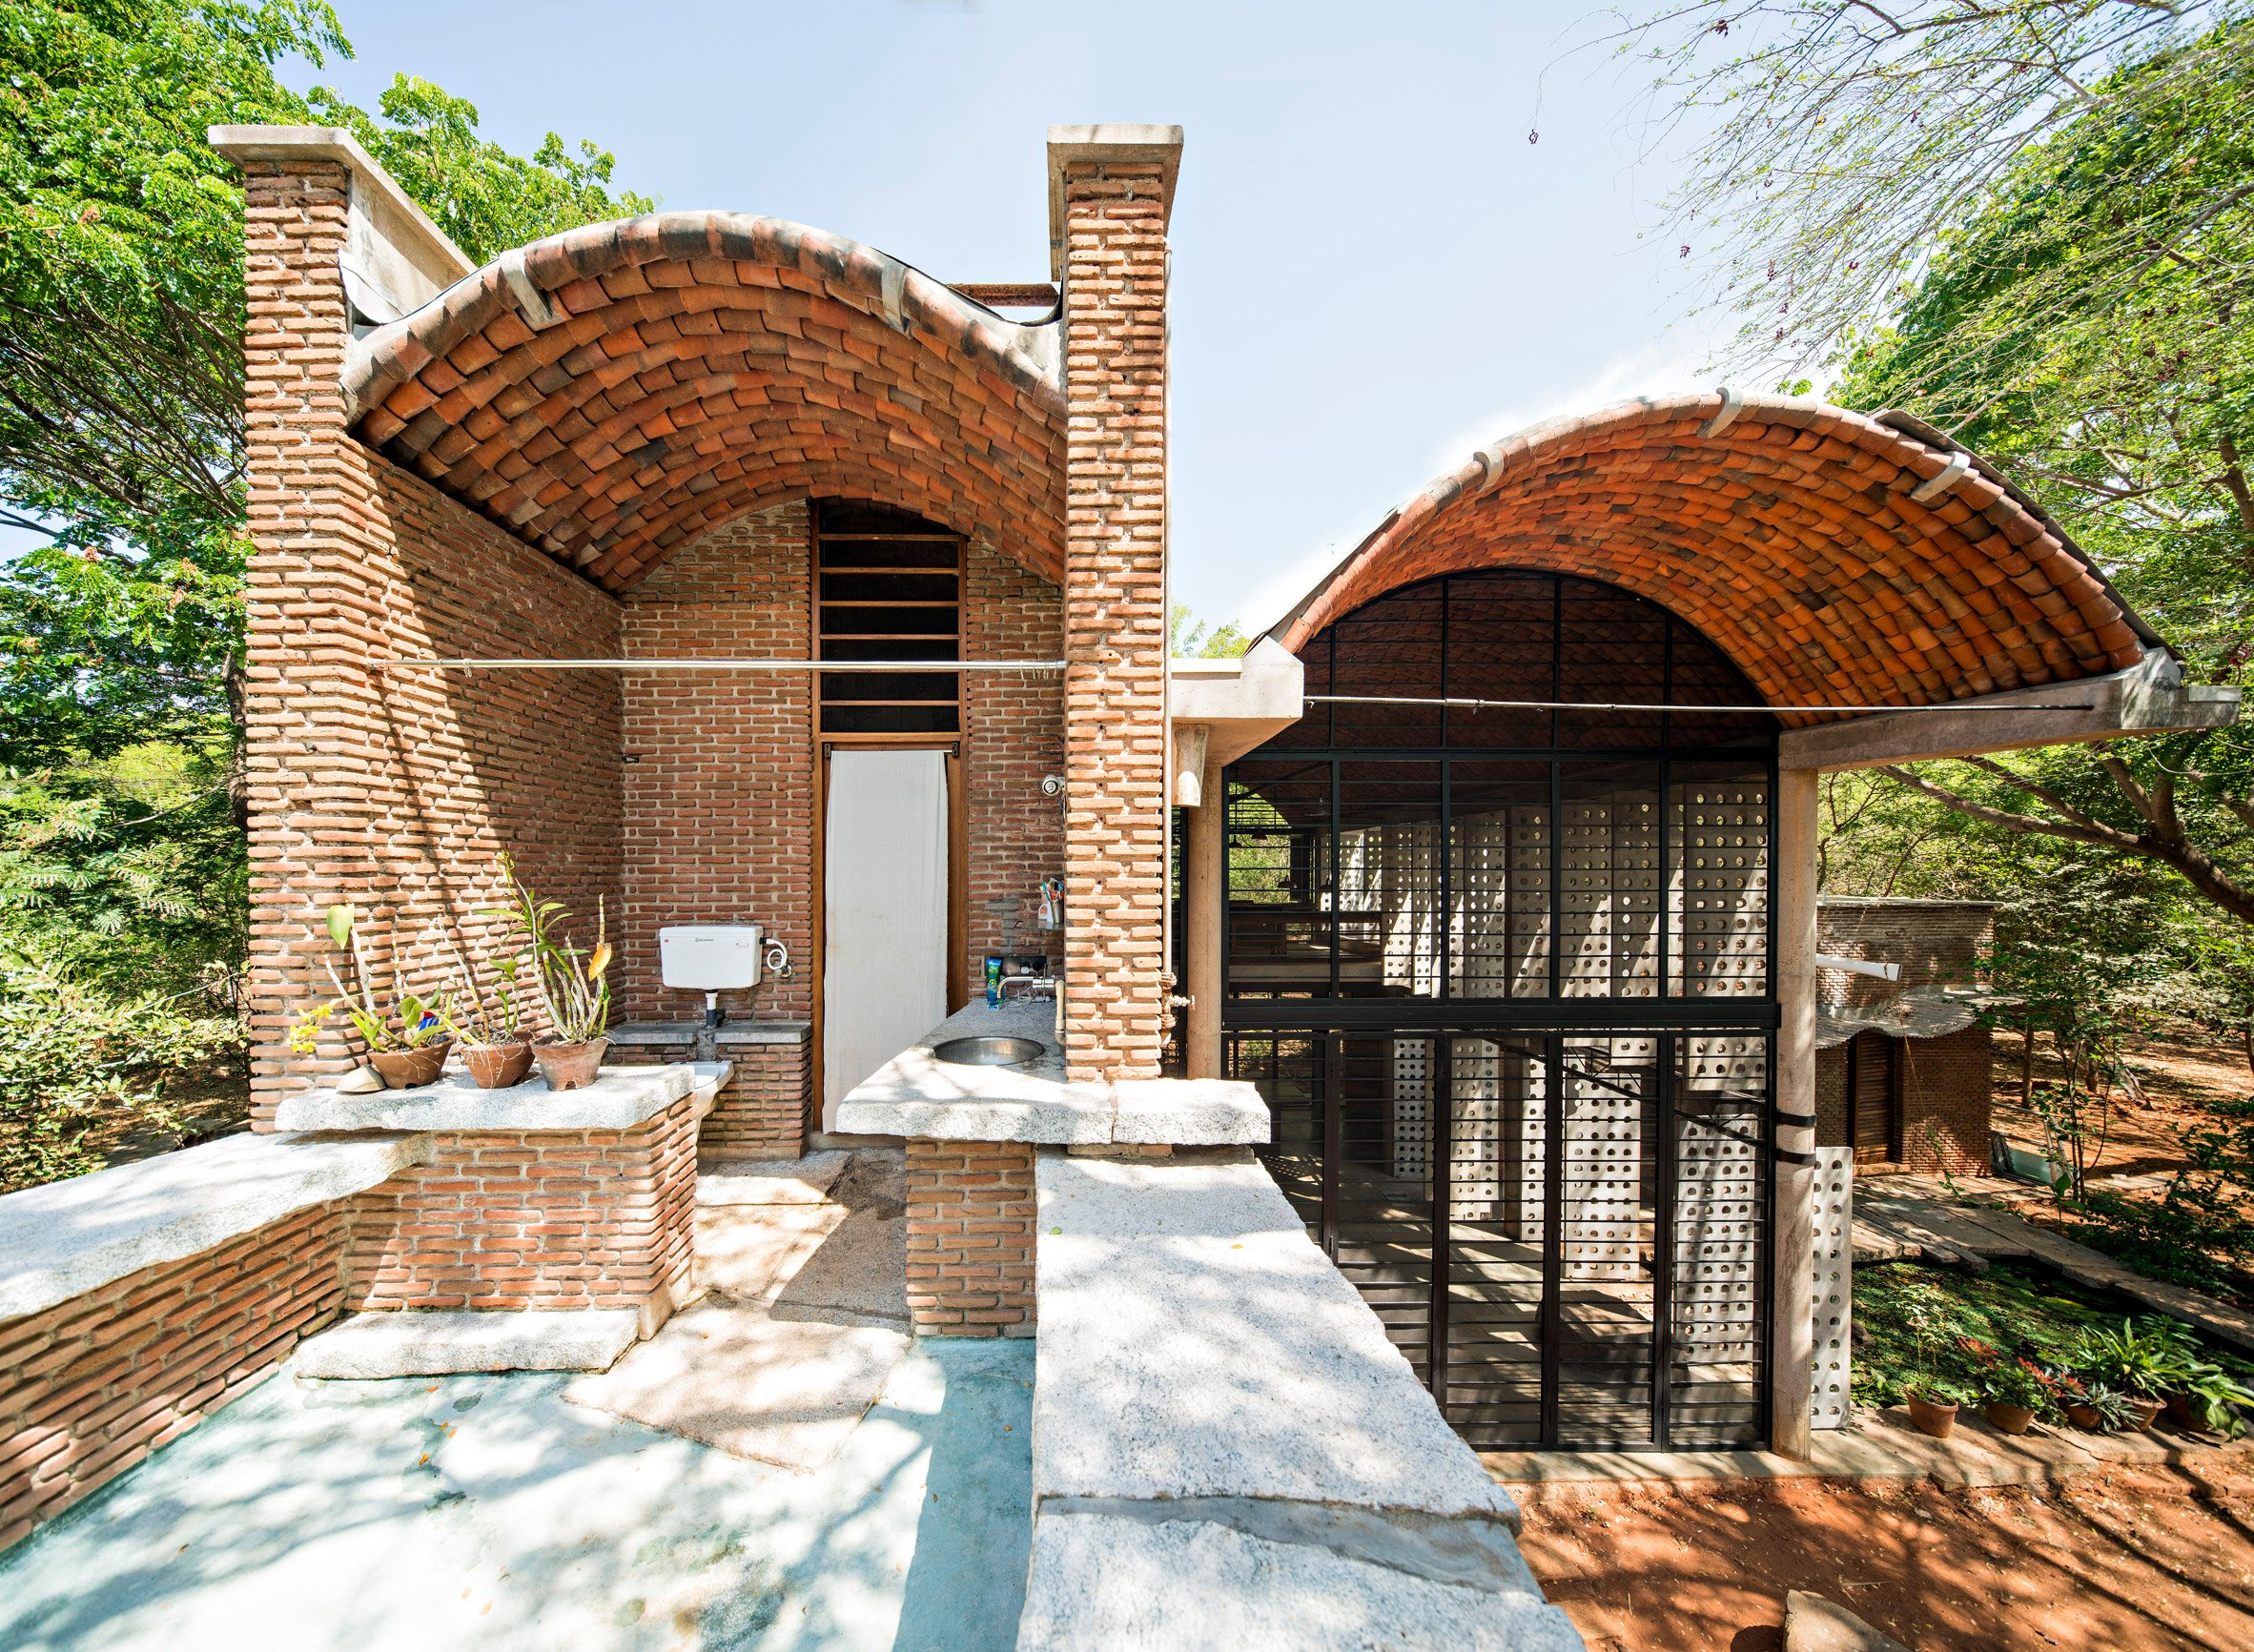 Anupama Kundoo architecture: Wall House, 2000, Auroville, India